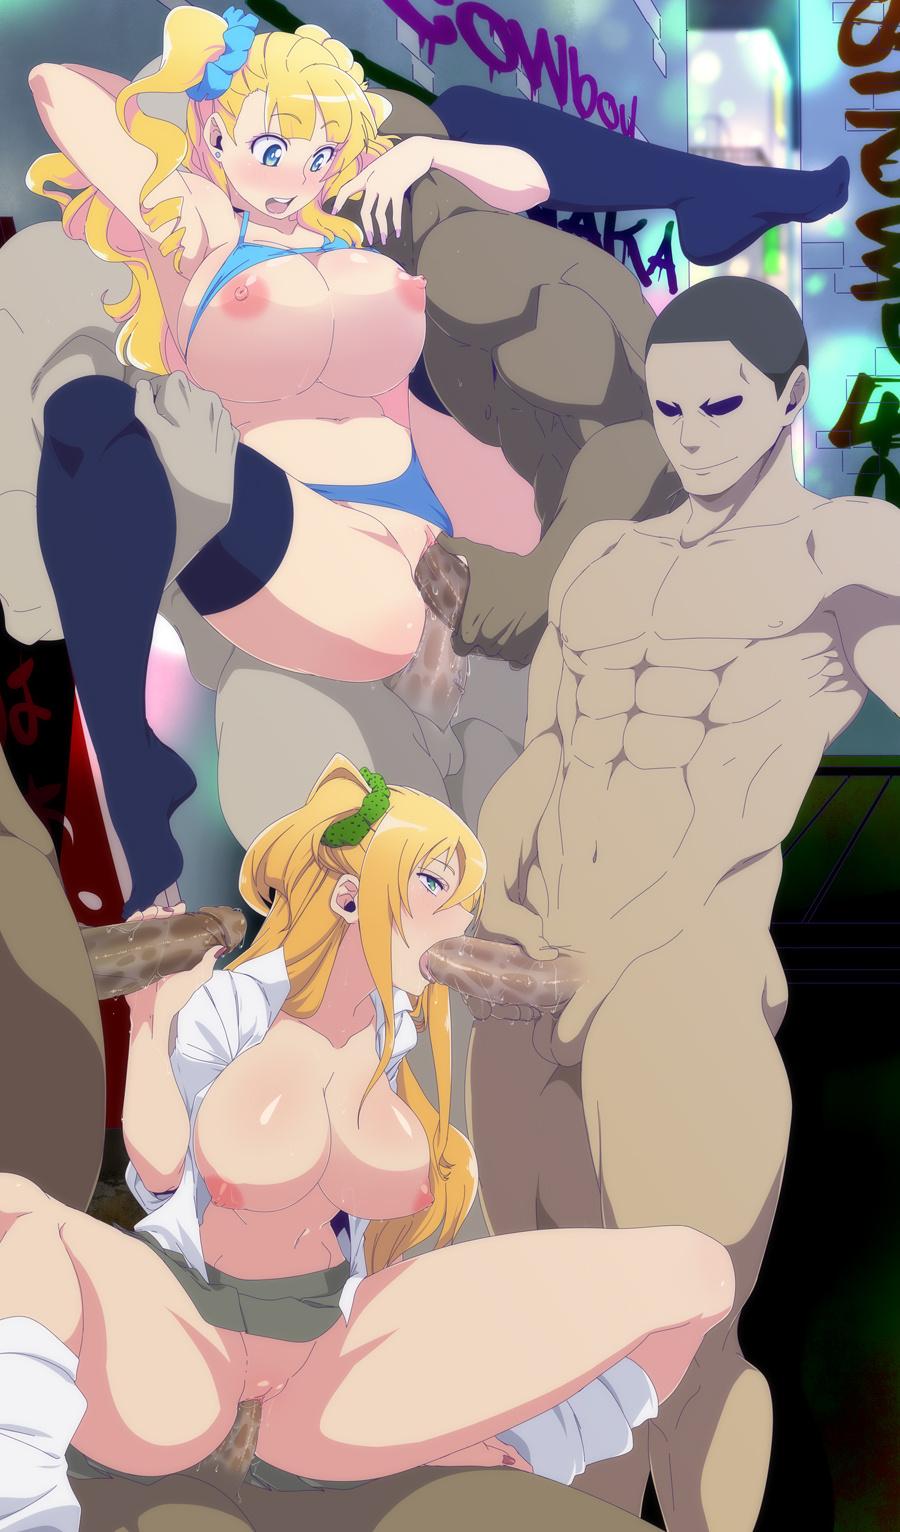 tell please galko-chan nikuko me Alien vs predator specimen 6